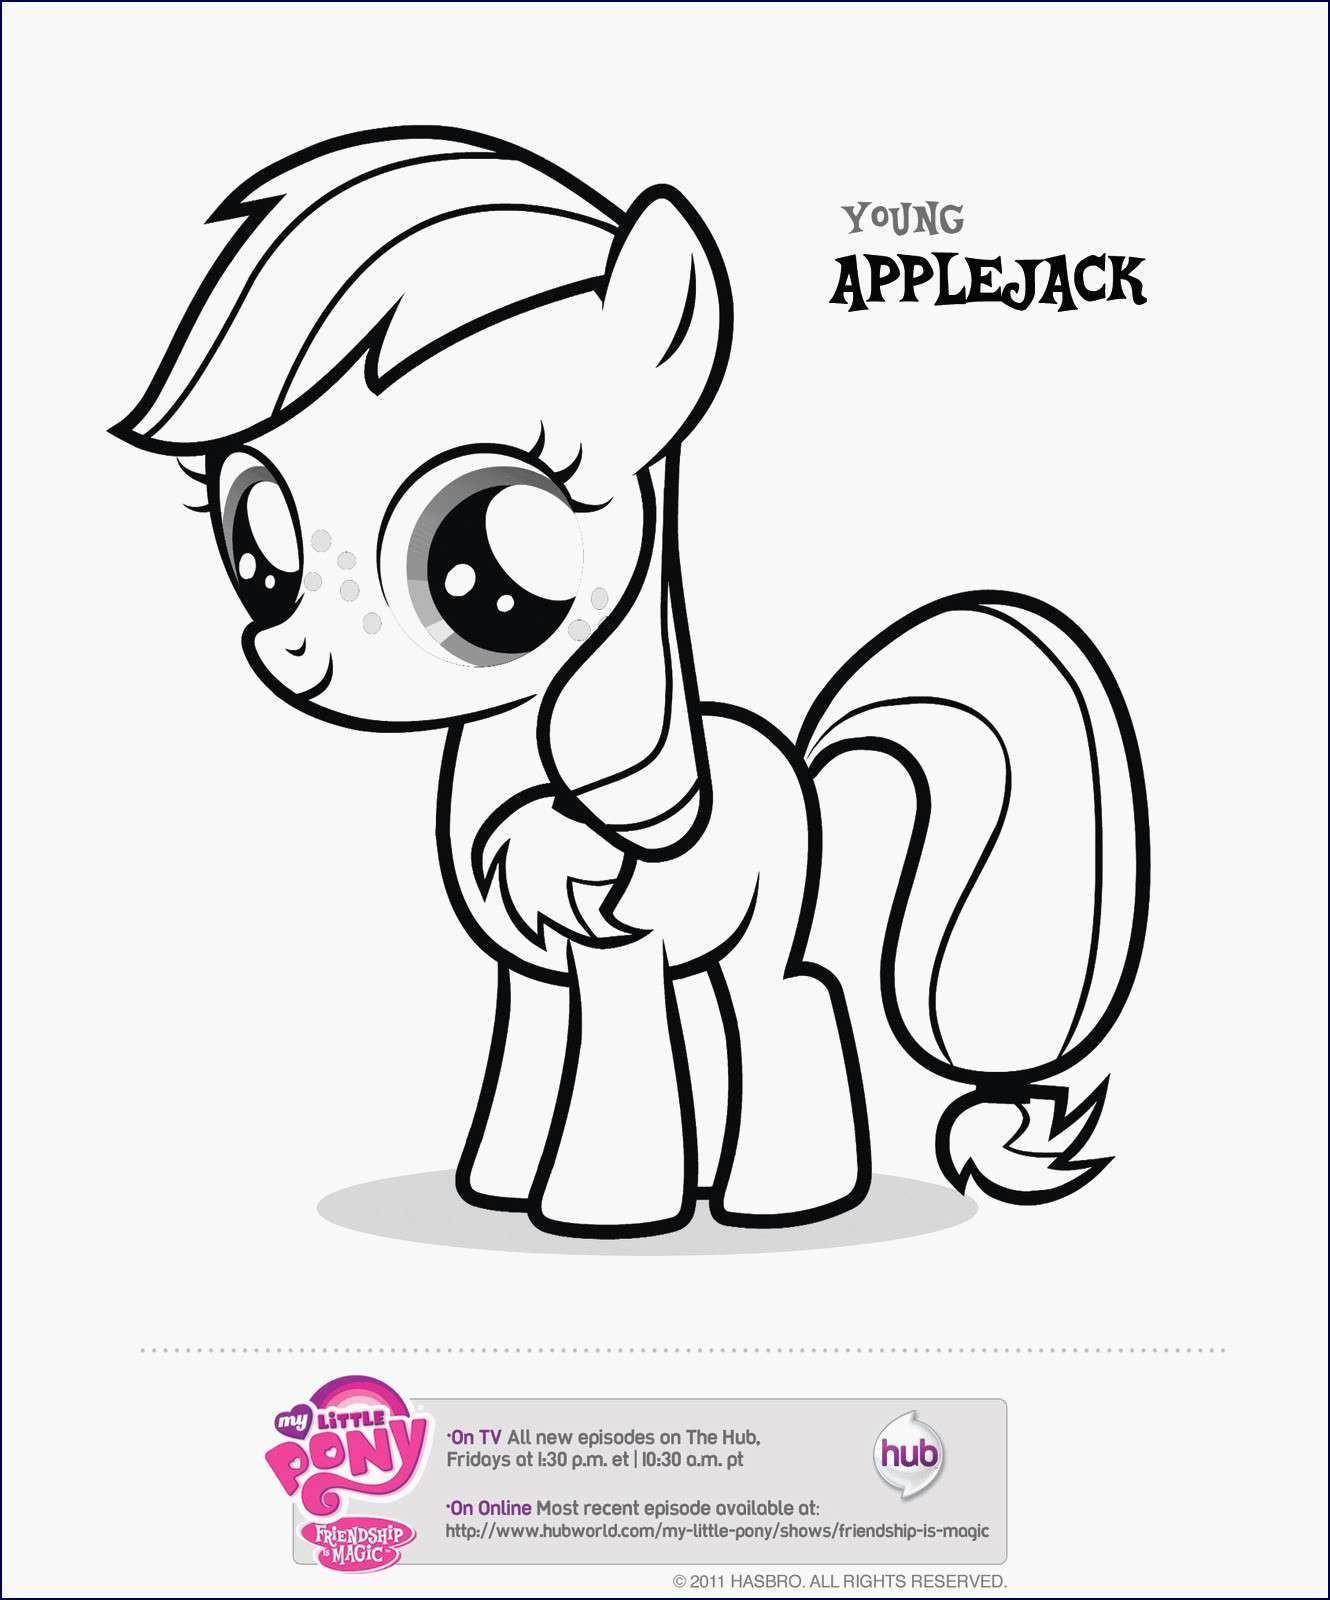 My Little Pony Friendship is Magic Ausmalbilder Inspirierend 36 Equestria Girls Fluttershy Coloring Pages Free Best Equestria Sammlung